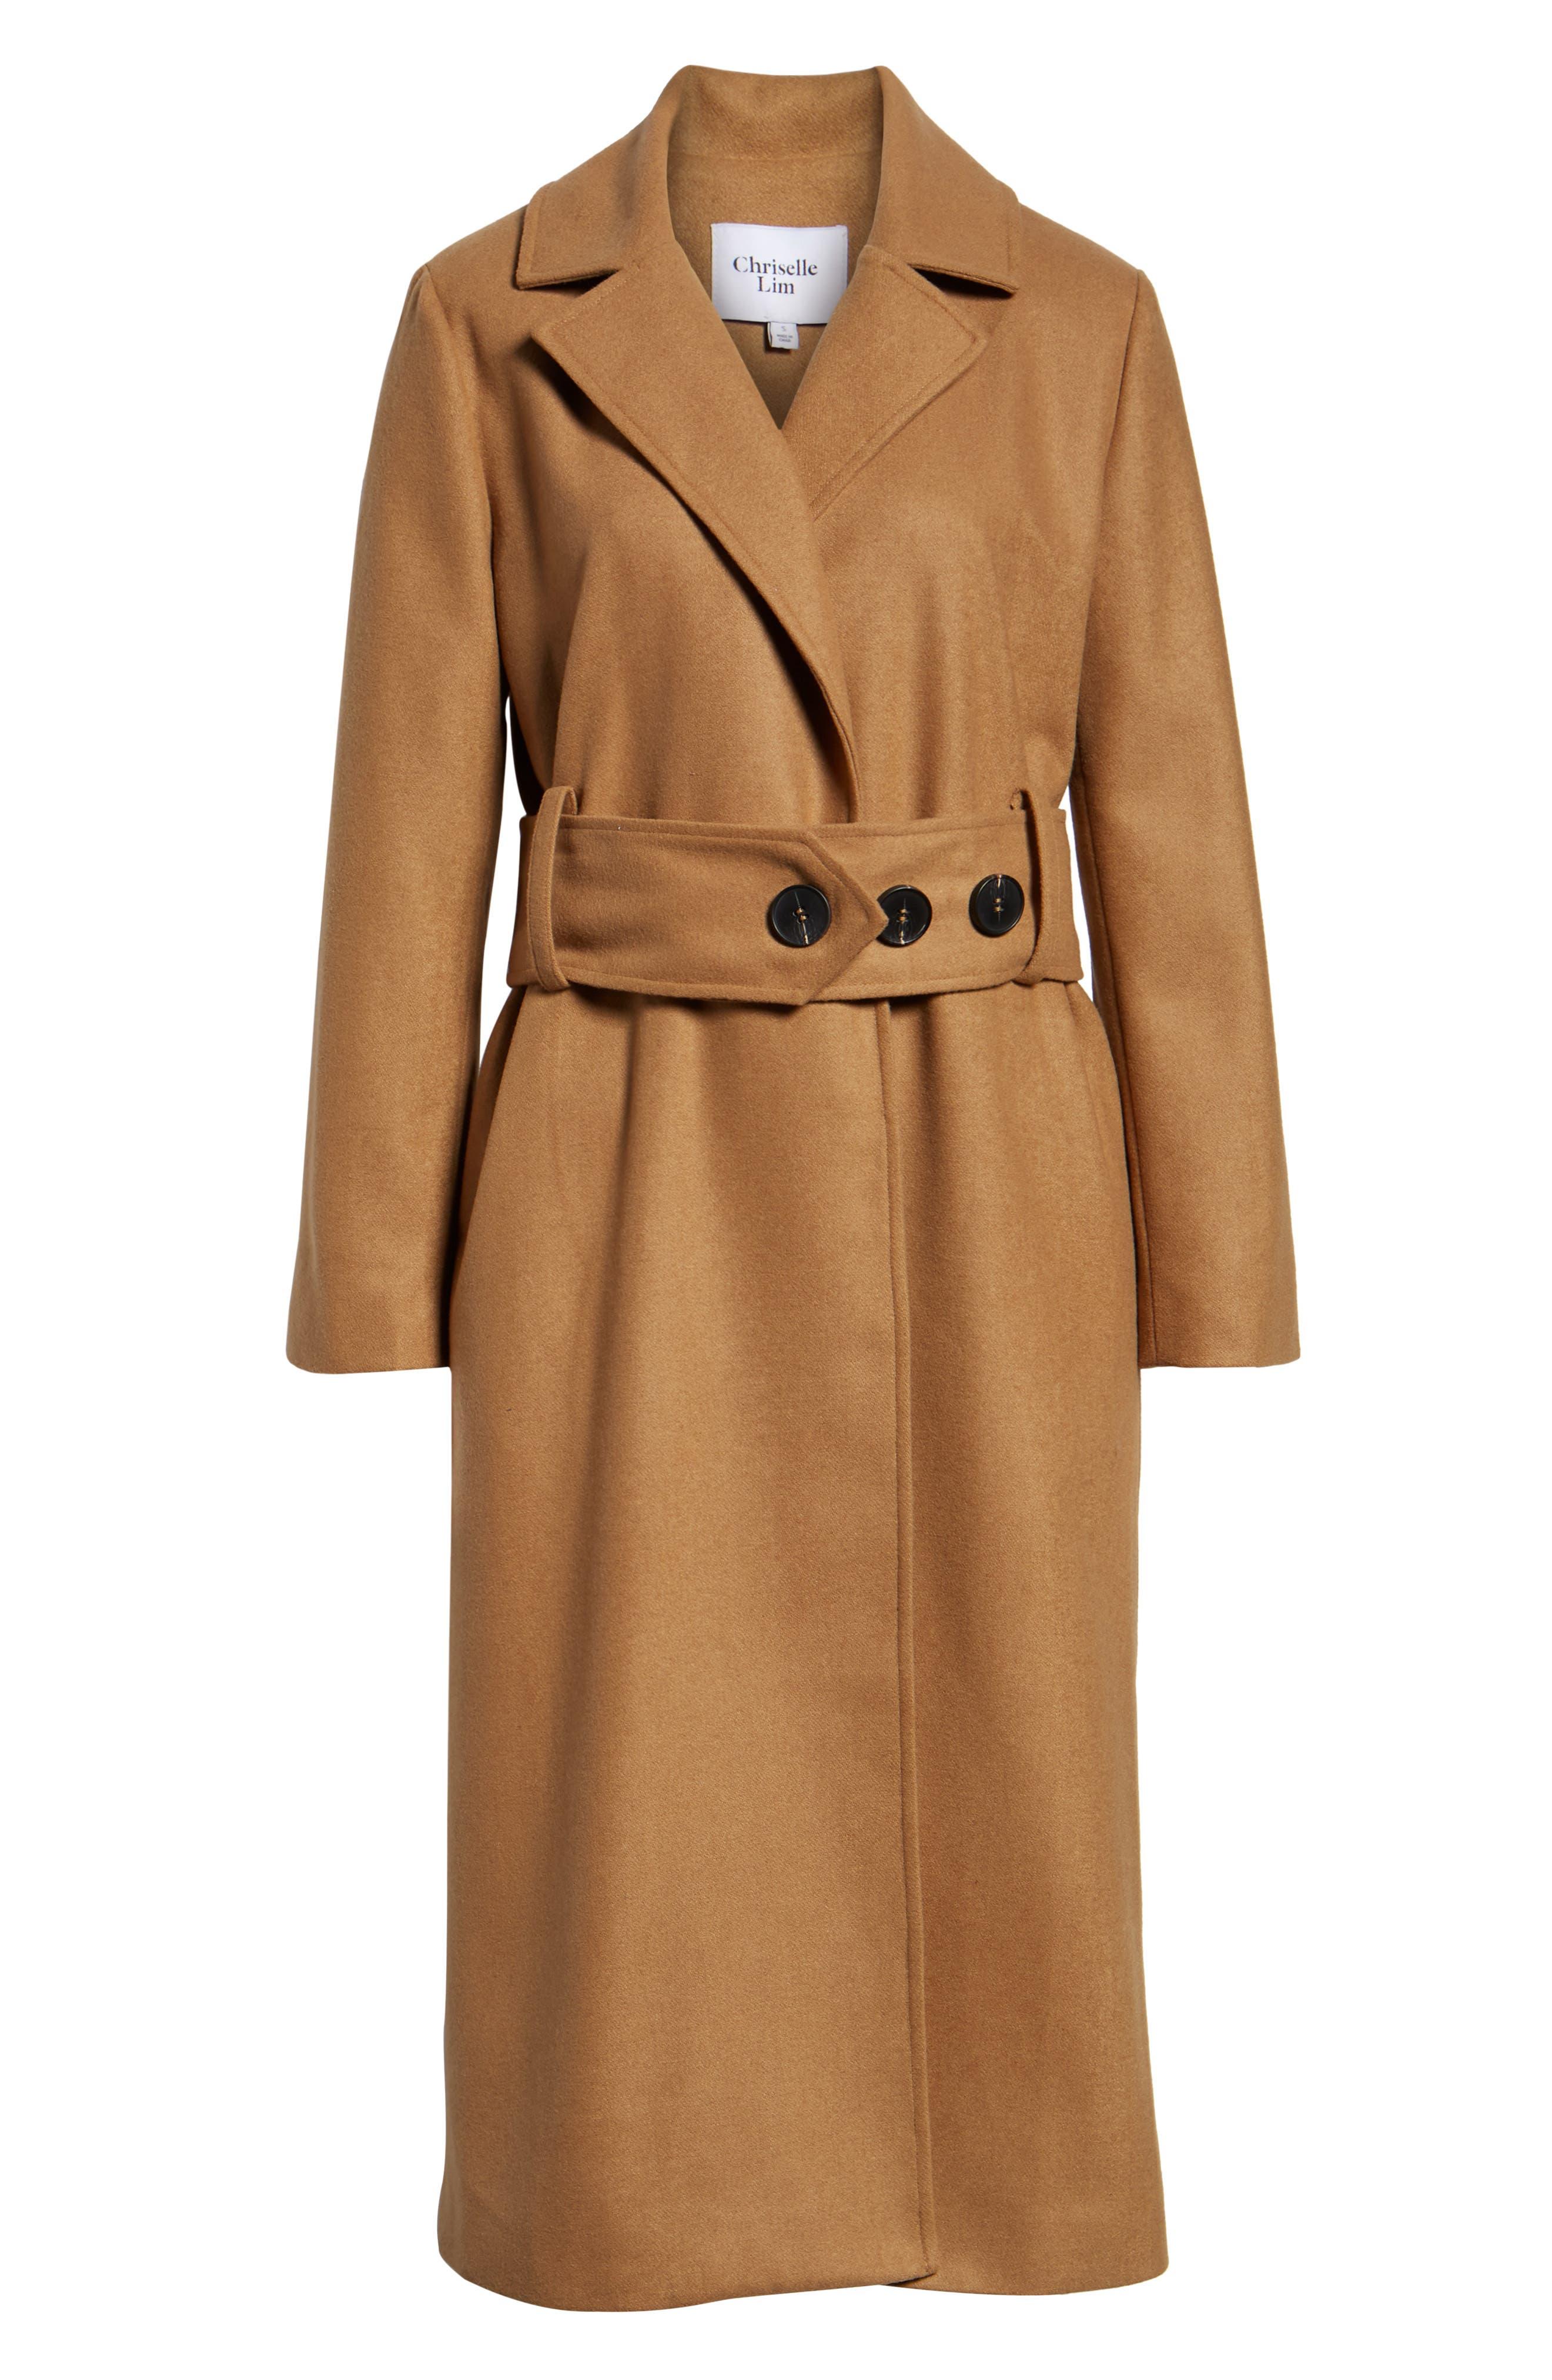 Chriselle Lim Victoria Belted Coat,                             Alternate thumbnail 6, color,                             CAMEL